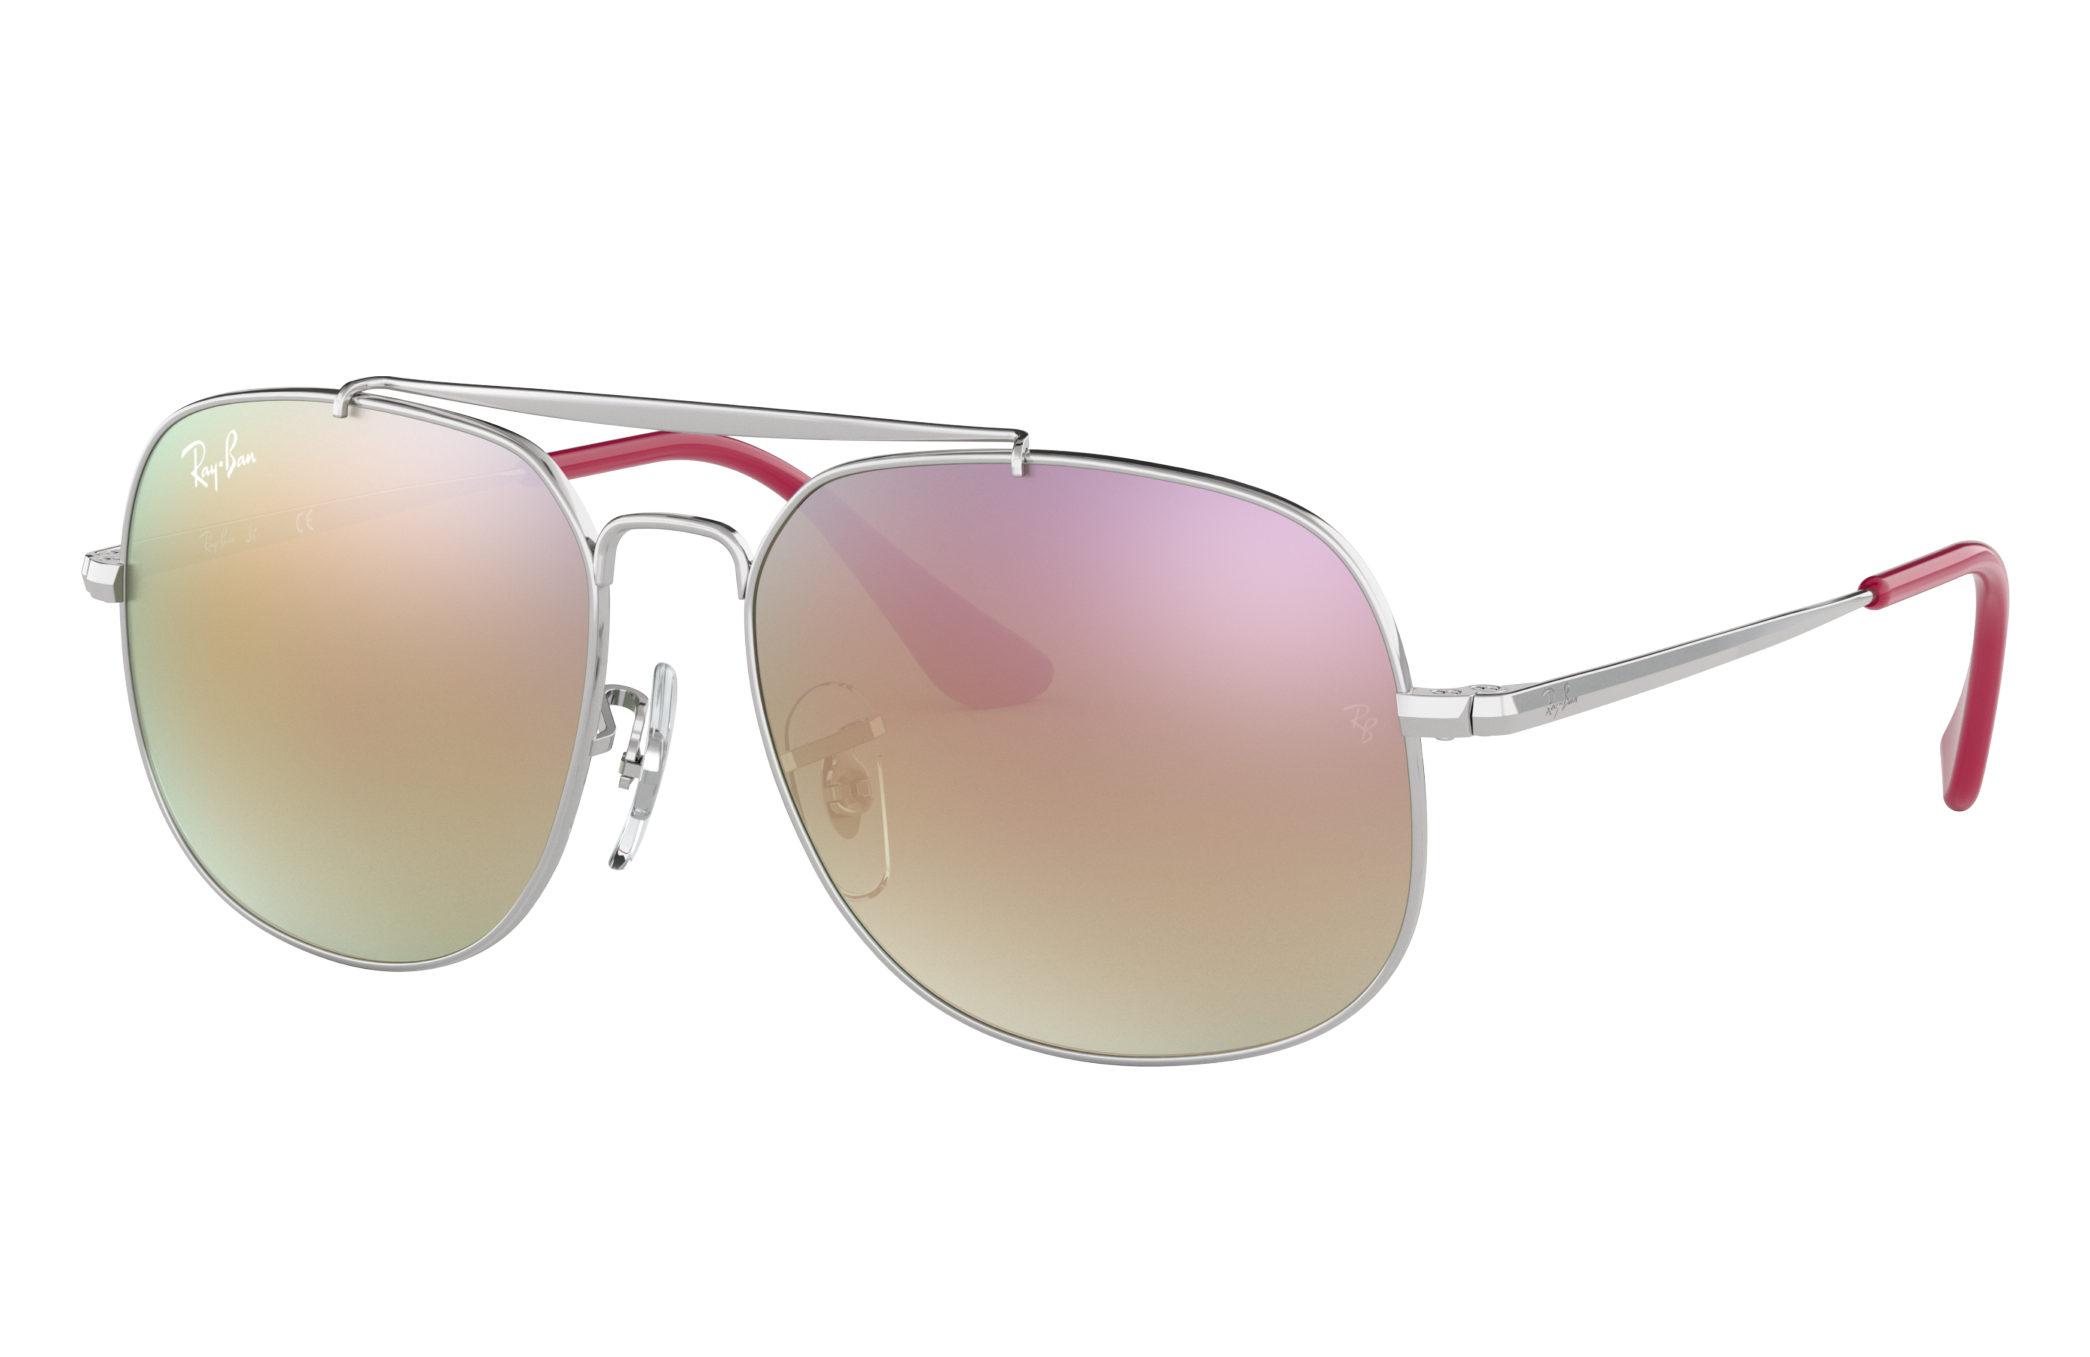 Ray-Ban General Junior Silver, Pink Lenses - RJ9561S